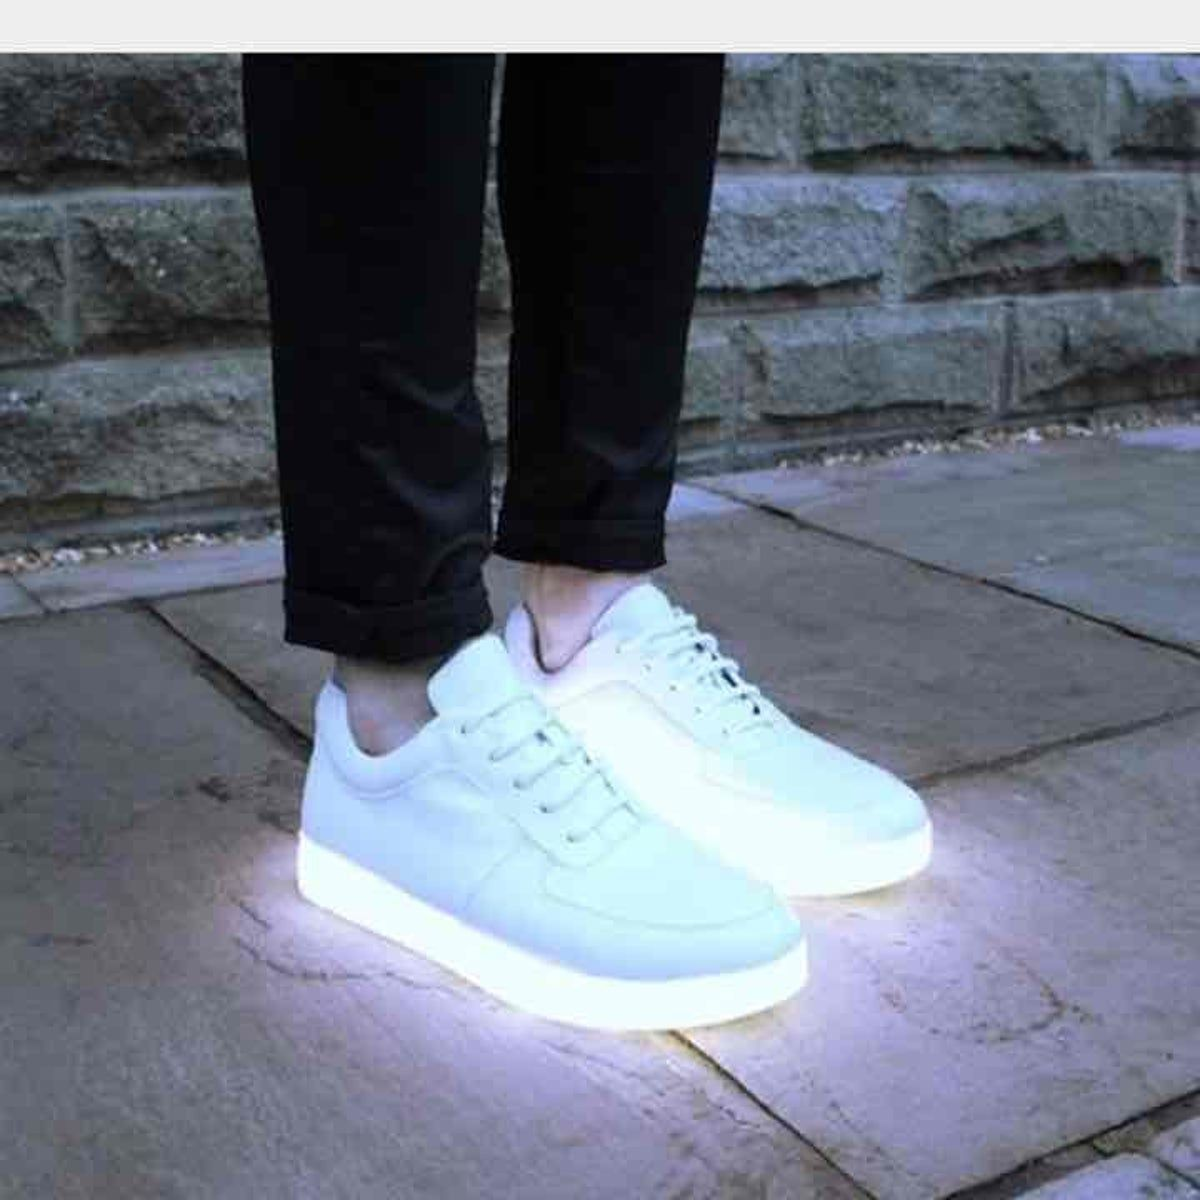 Futuristic White size 11 Led sneakers